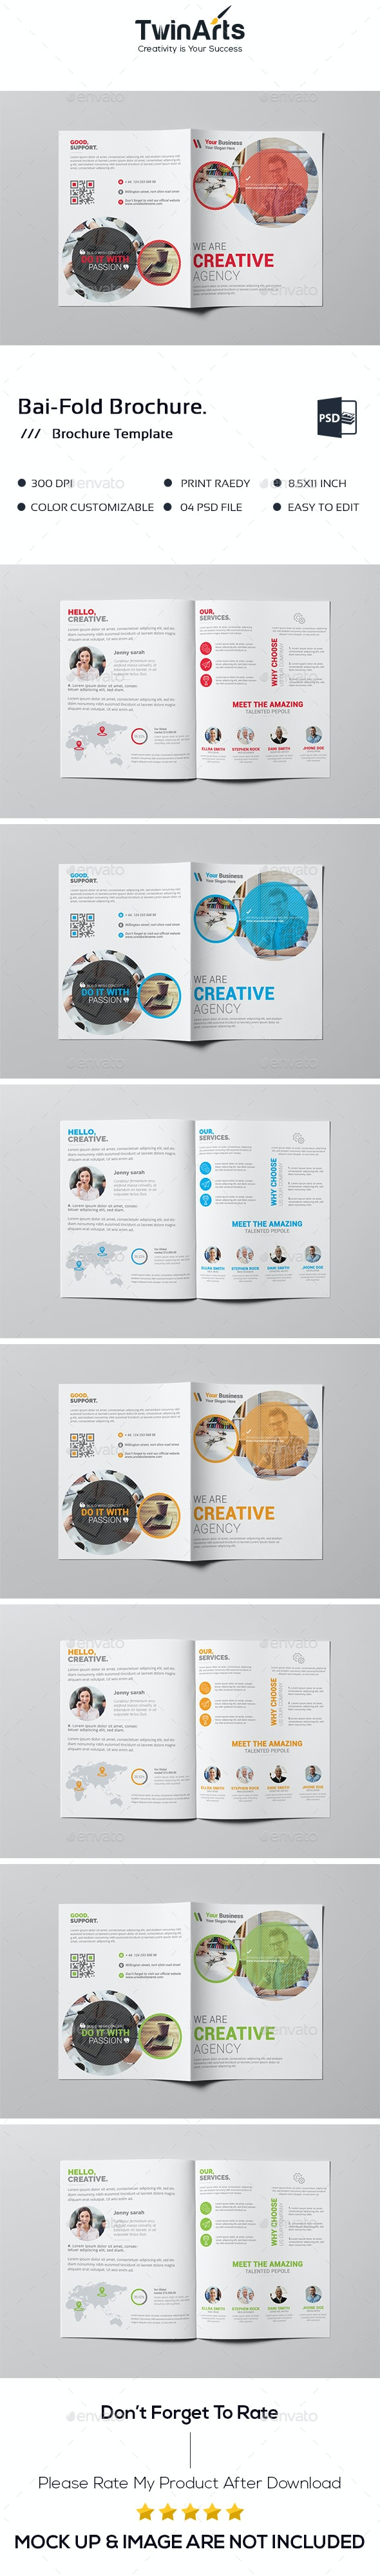 Bai-Fold Brochure. - Brochures Print Templates